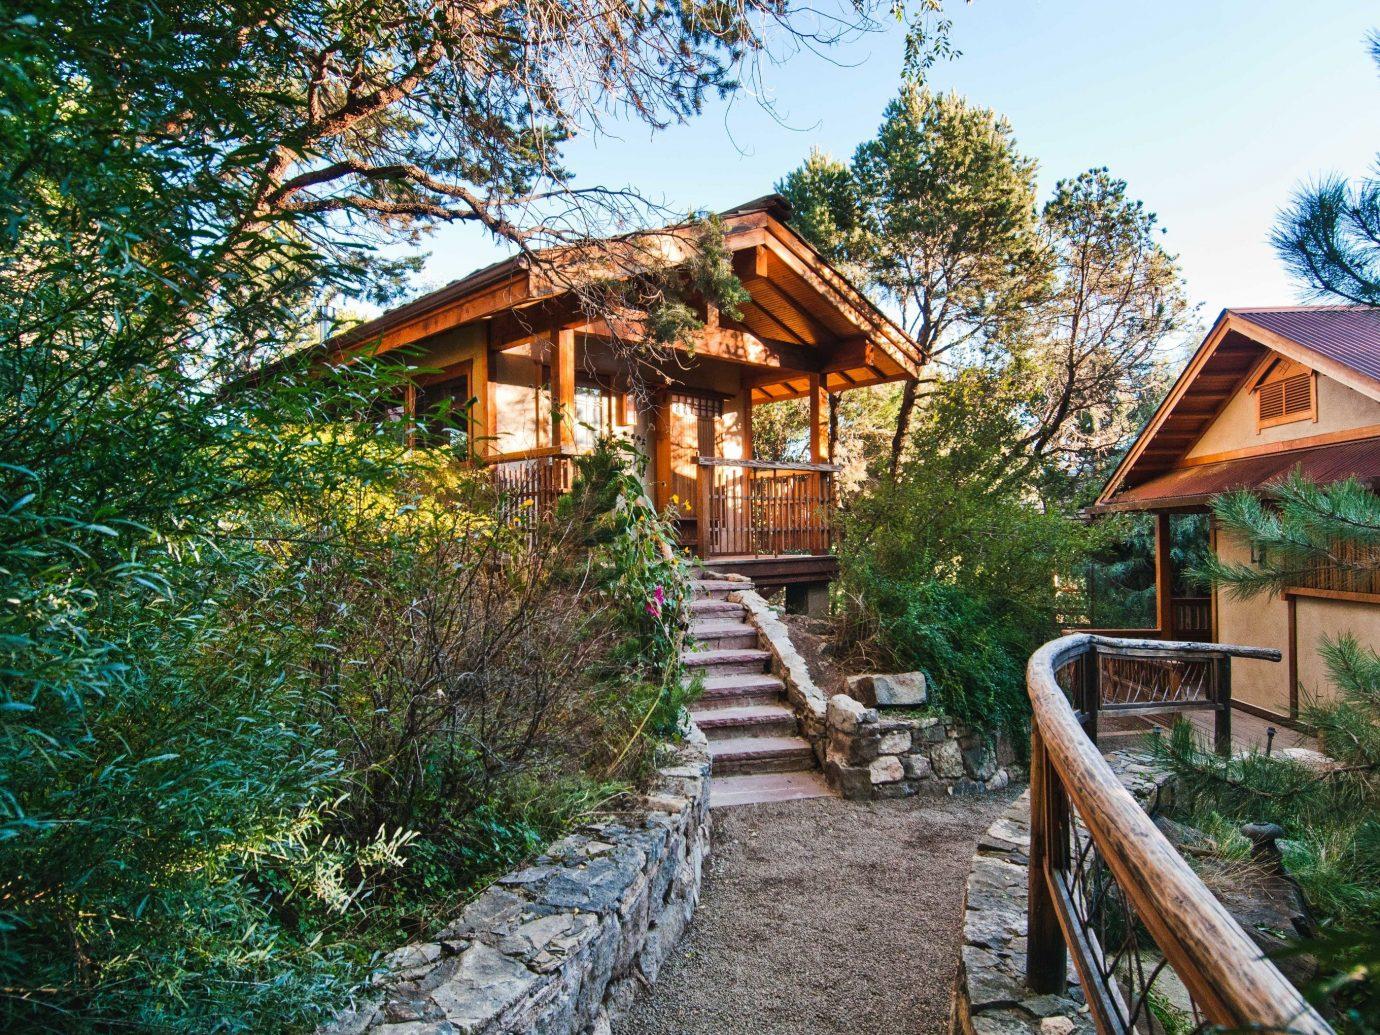 property tree cottage house home log cabin real estate plant path outdoor structure hut landscape Resort estate Jungle